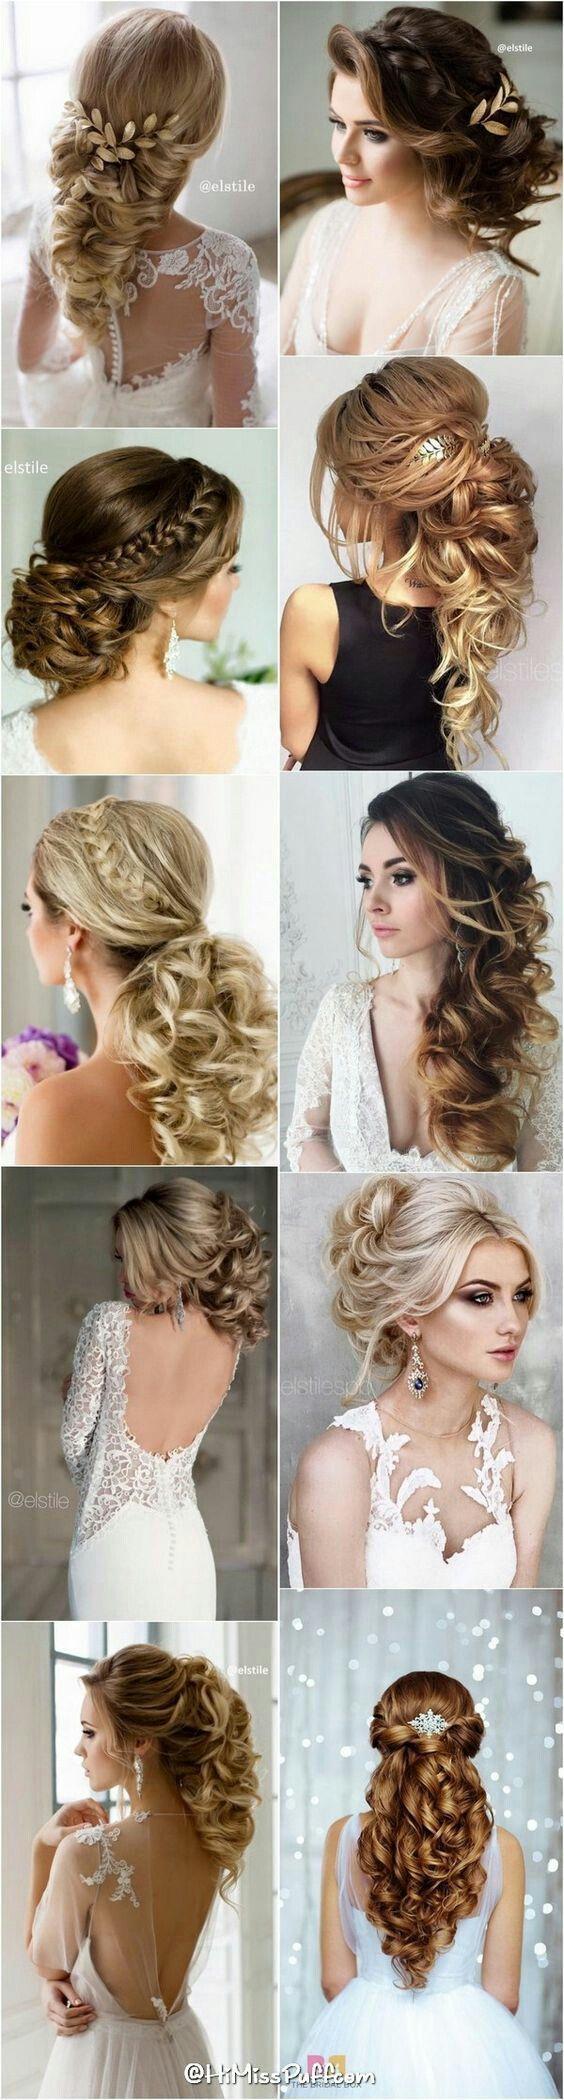 Fairytale Princess Chic Wedding Hairstyles Hair Styles Long Hair Styles Wedding Hairstyles For Long Hair